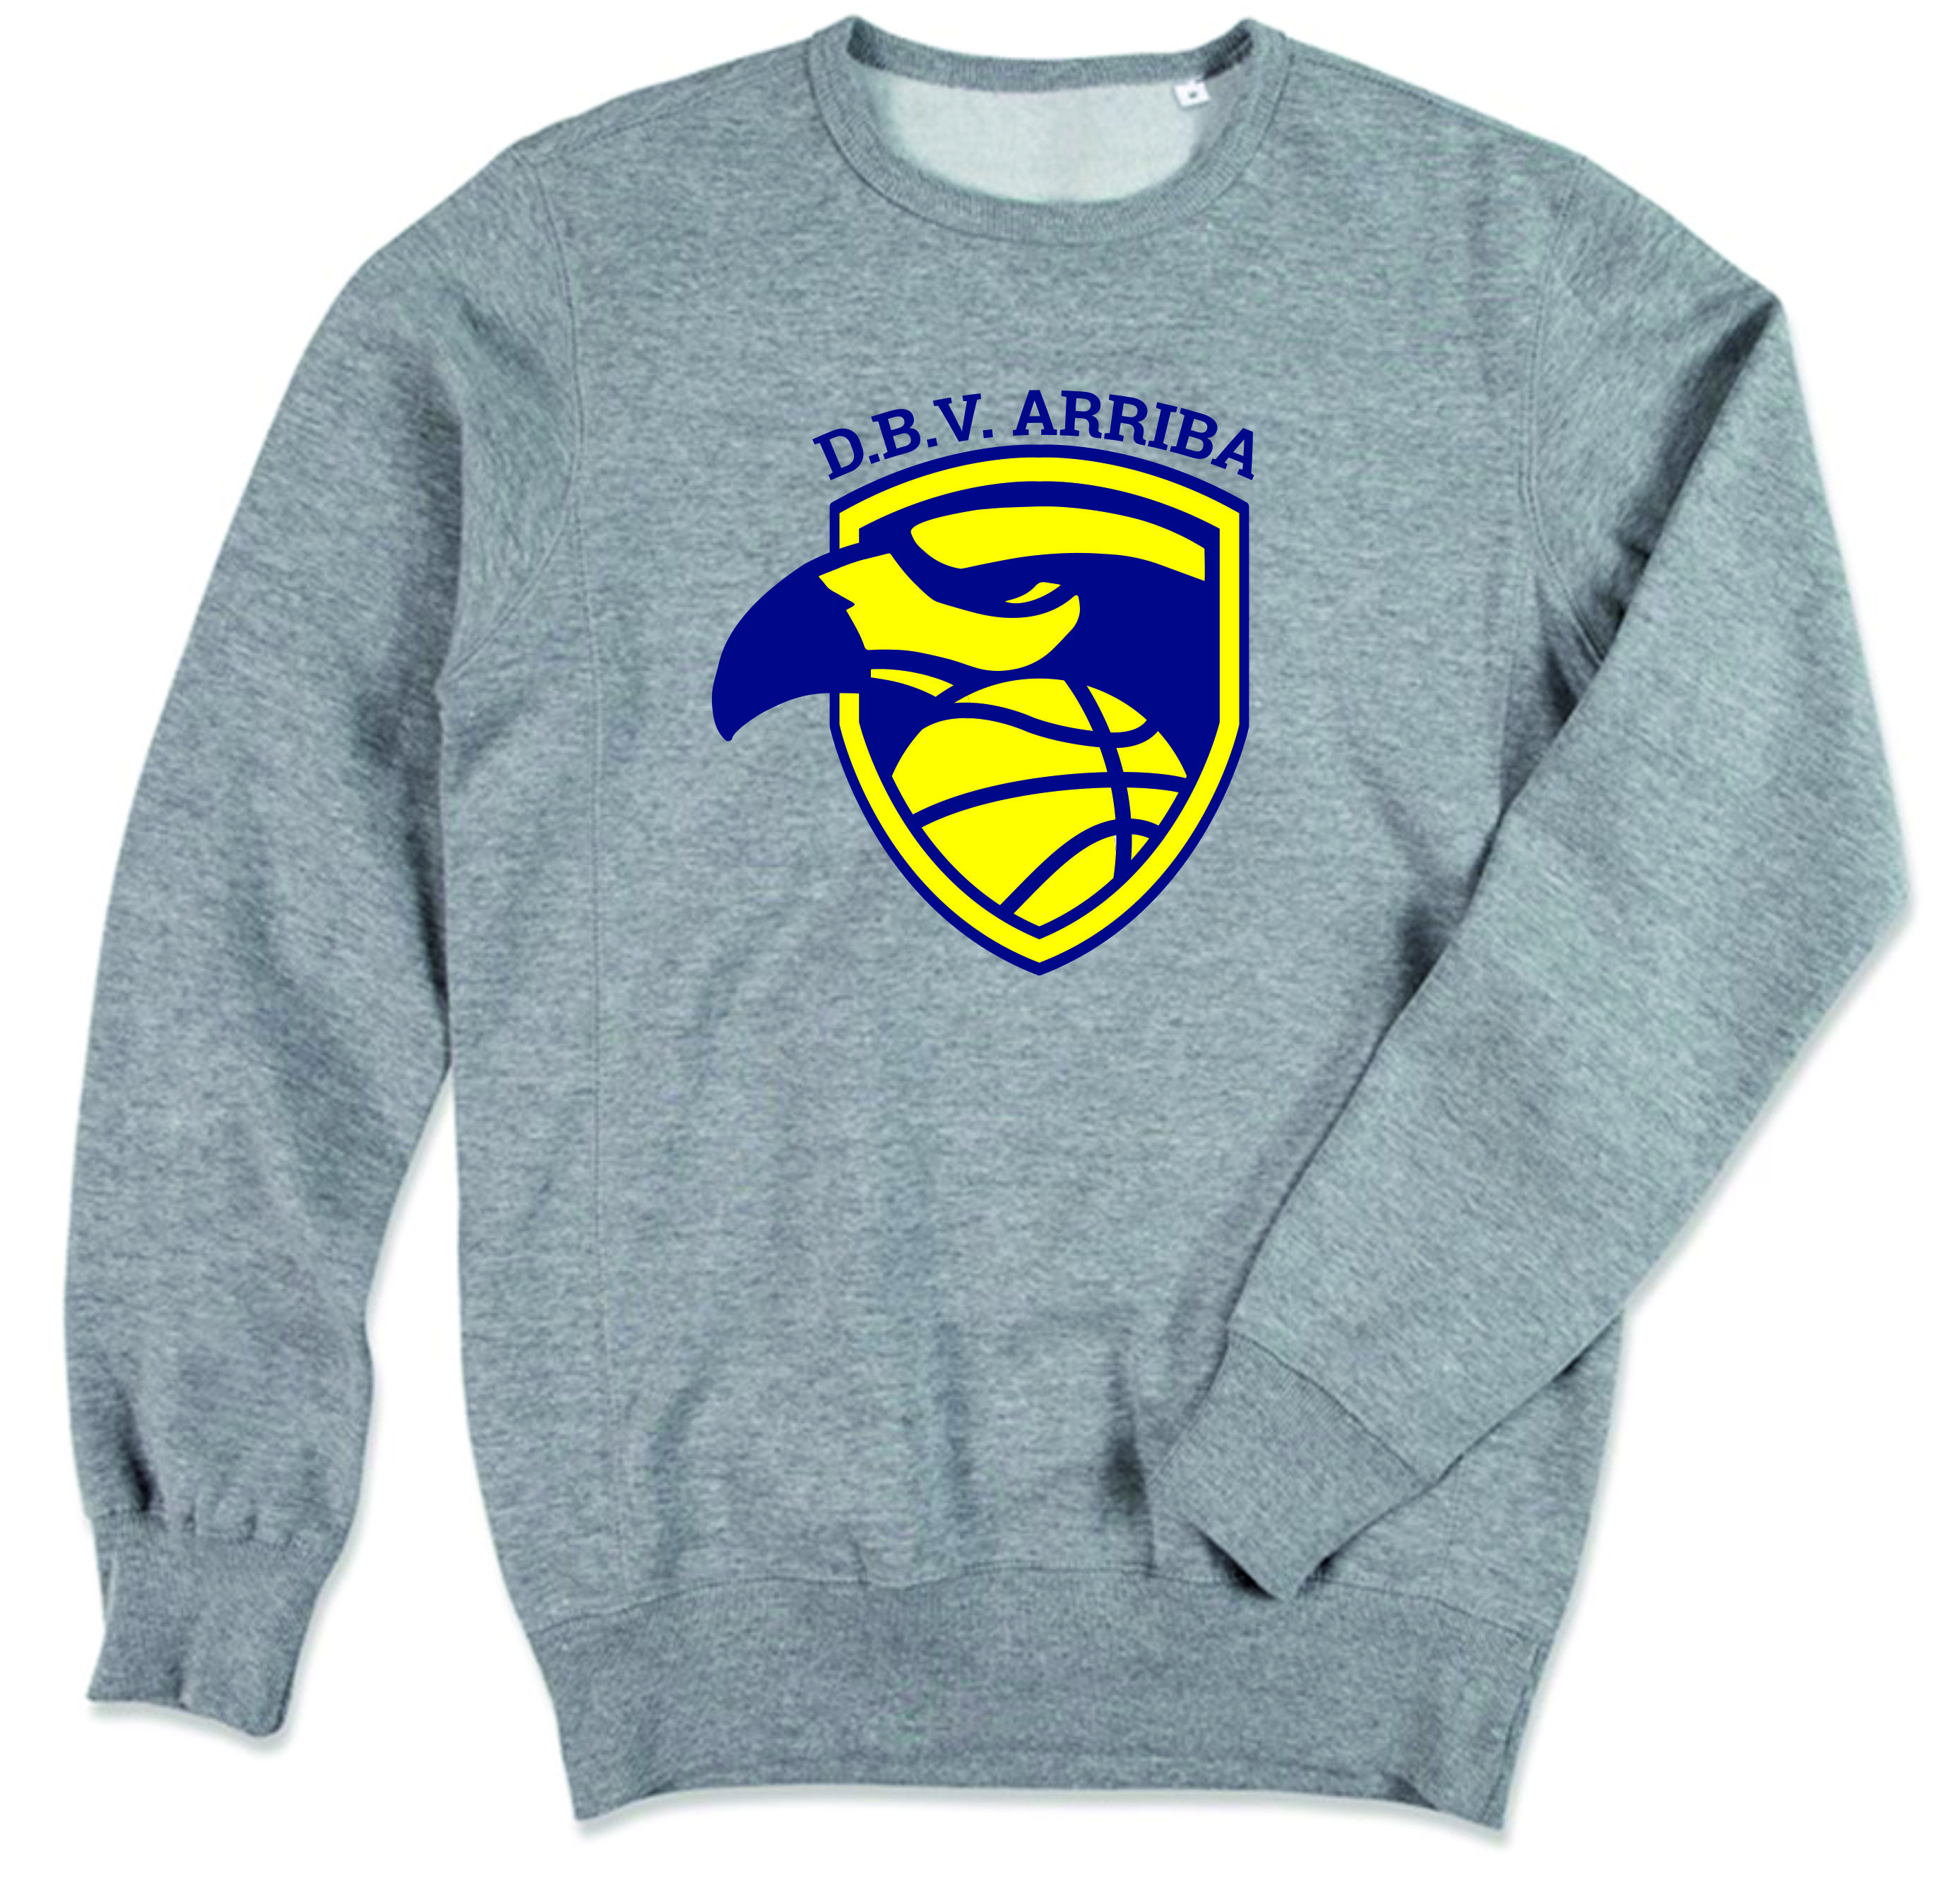 Grey sweater (big logo) Image